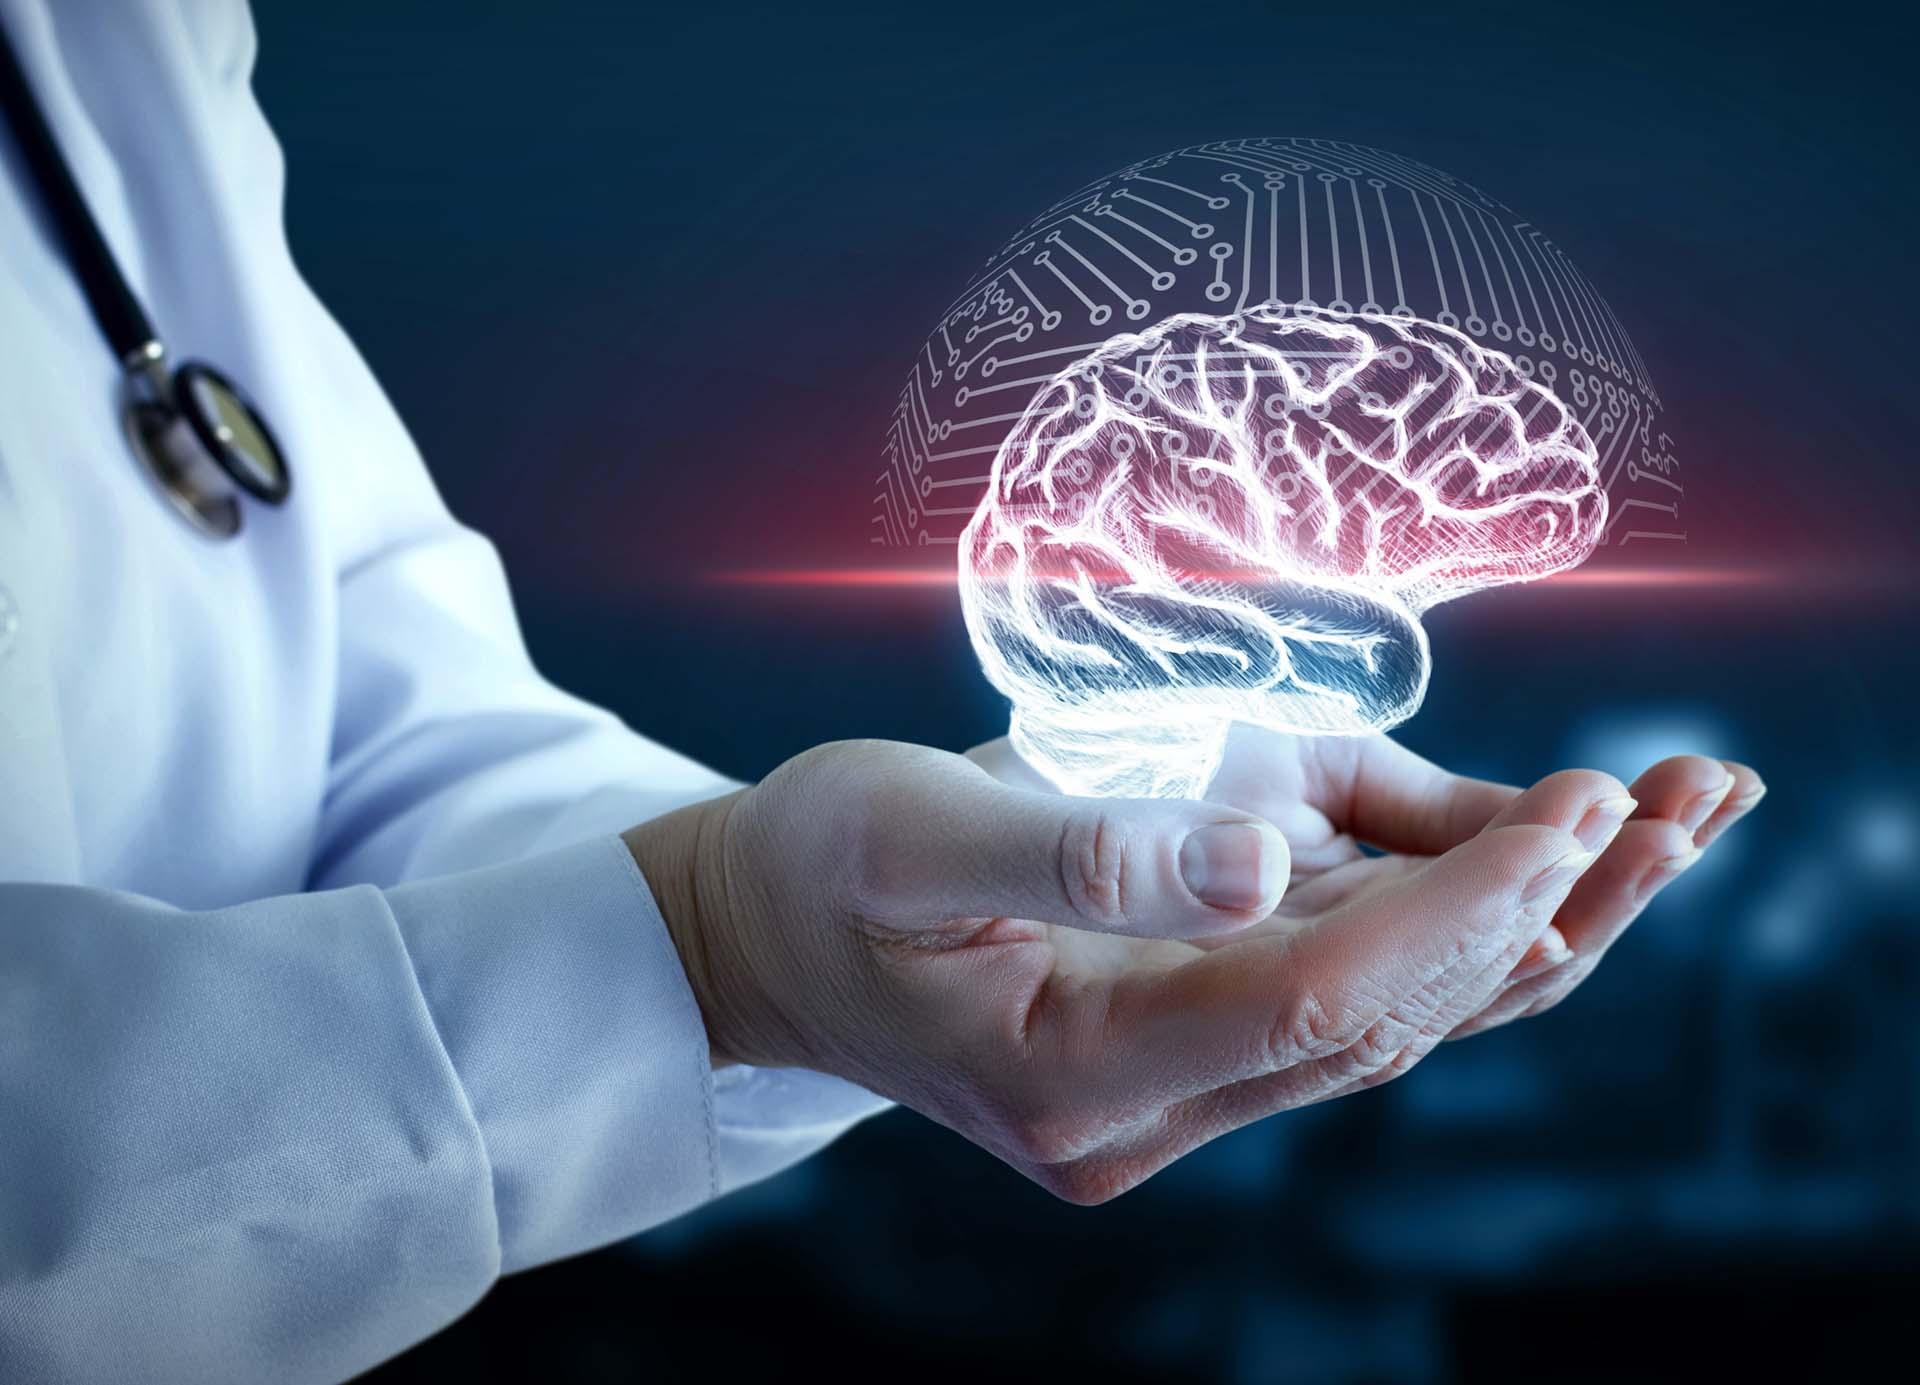 Vlaamse Vereniging voor Neurologie